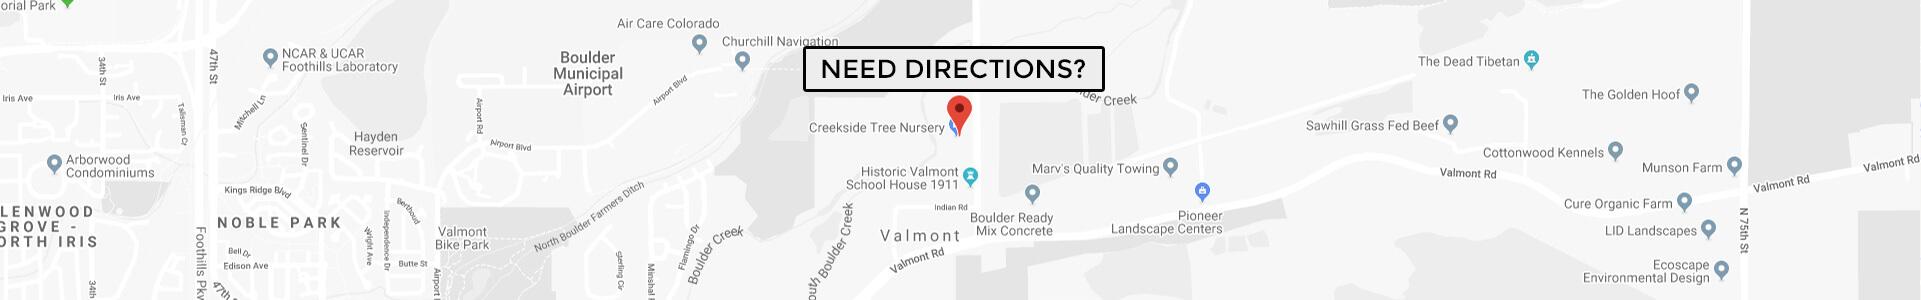 Need Directions to CreekSide Tree Nursery